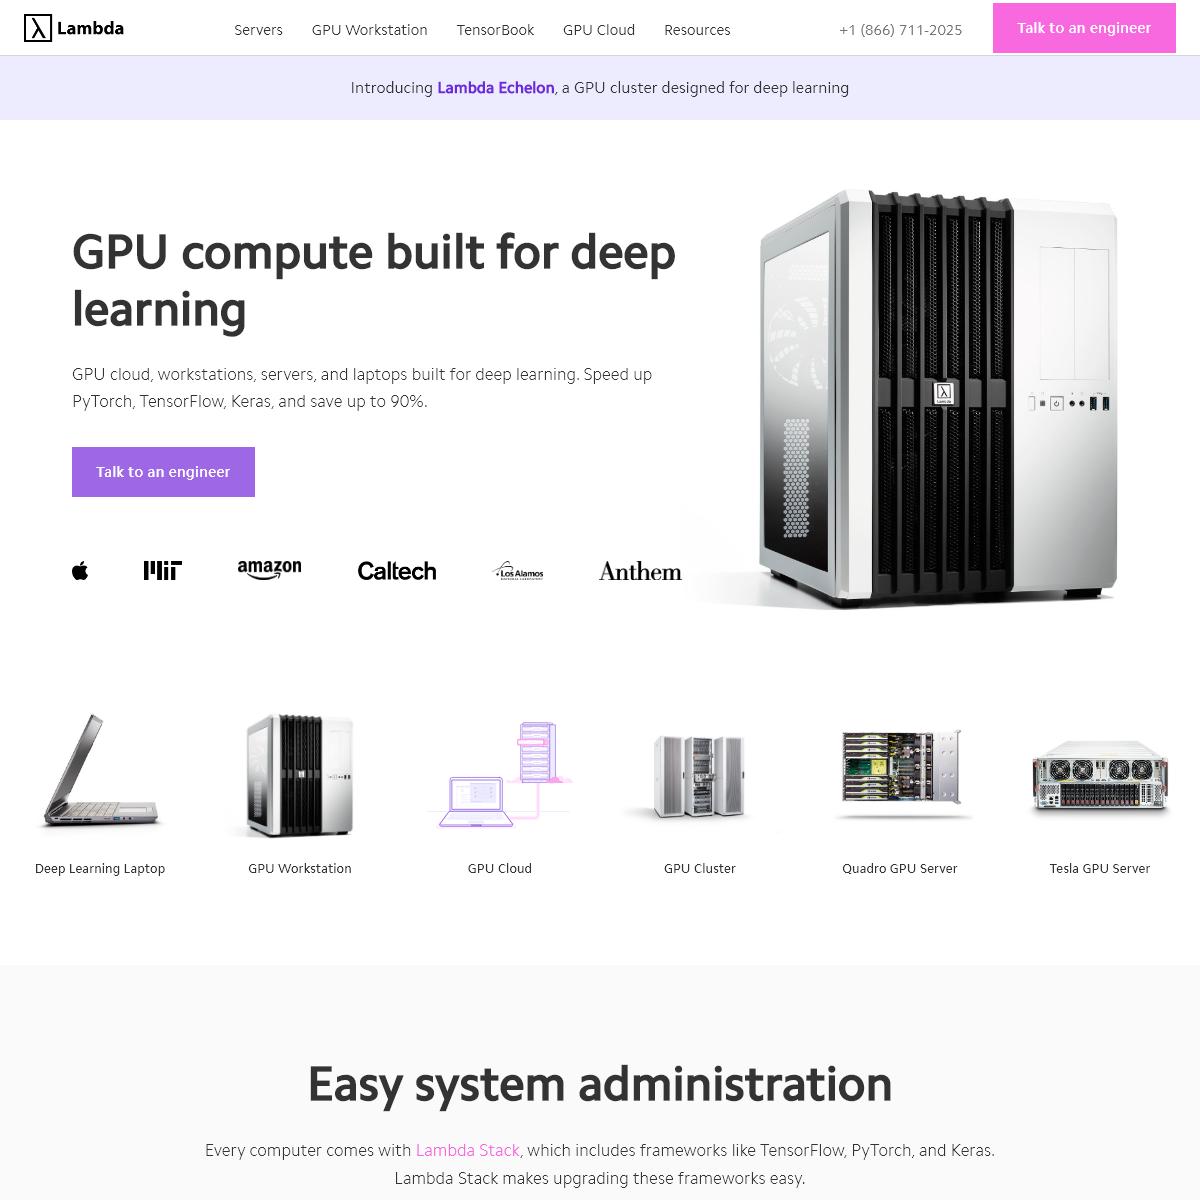 GPU Cloud, Workstations, Servers, Laptops for Deep Learning - Lambda